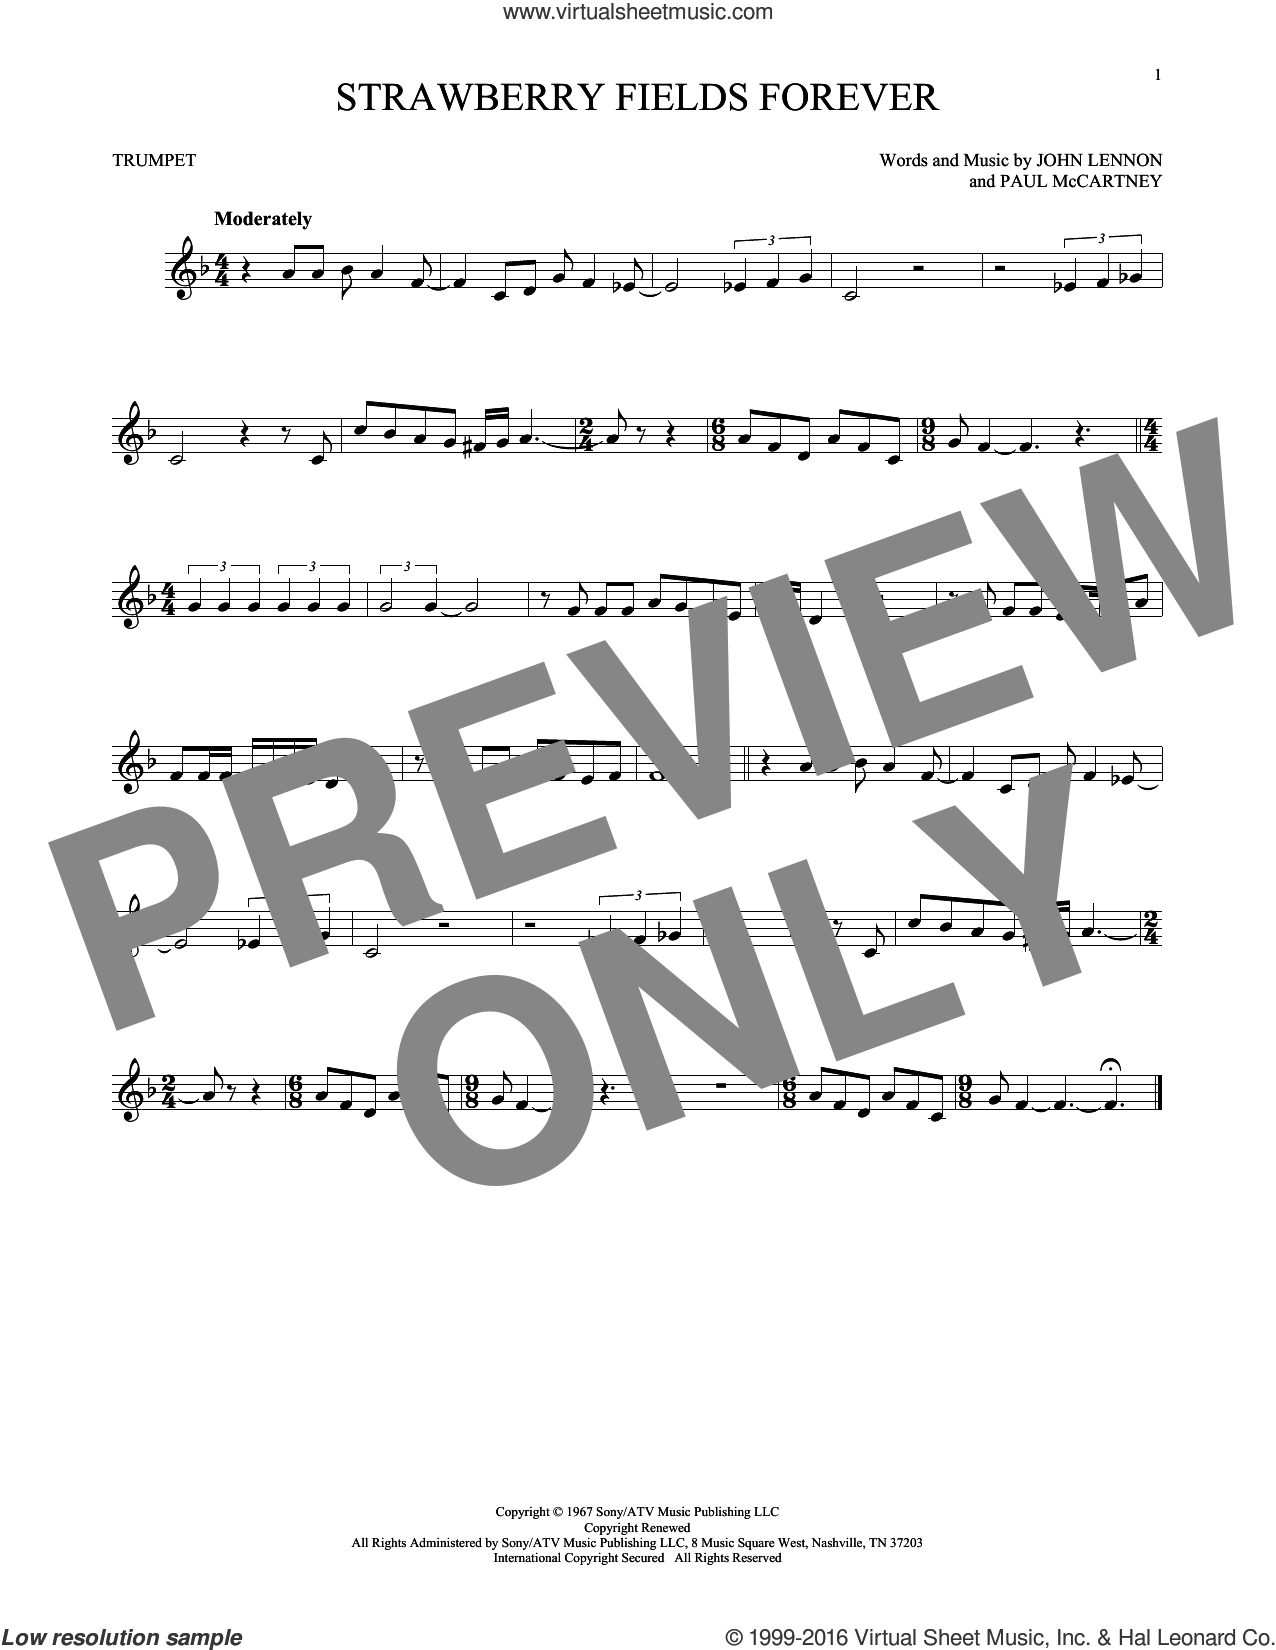 Strawberry Fields Forever sheet music for trumpet solo by The Beatles, John Lennon and Paul McCartney, intermediate skill level